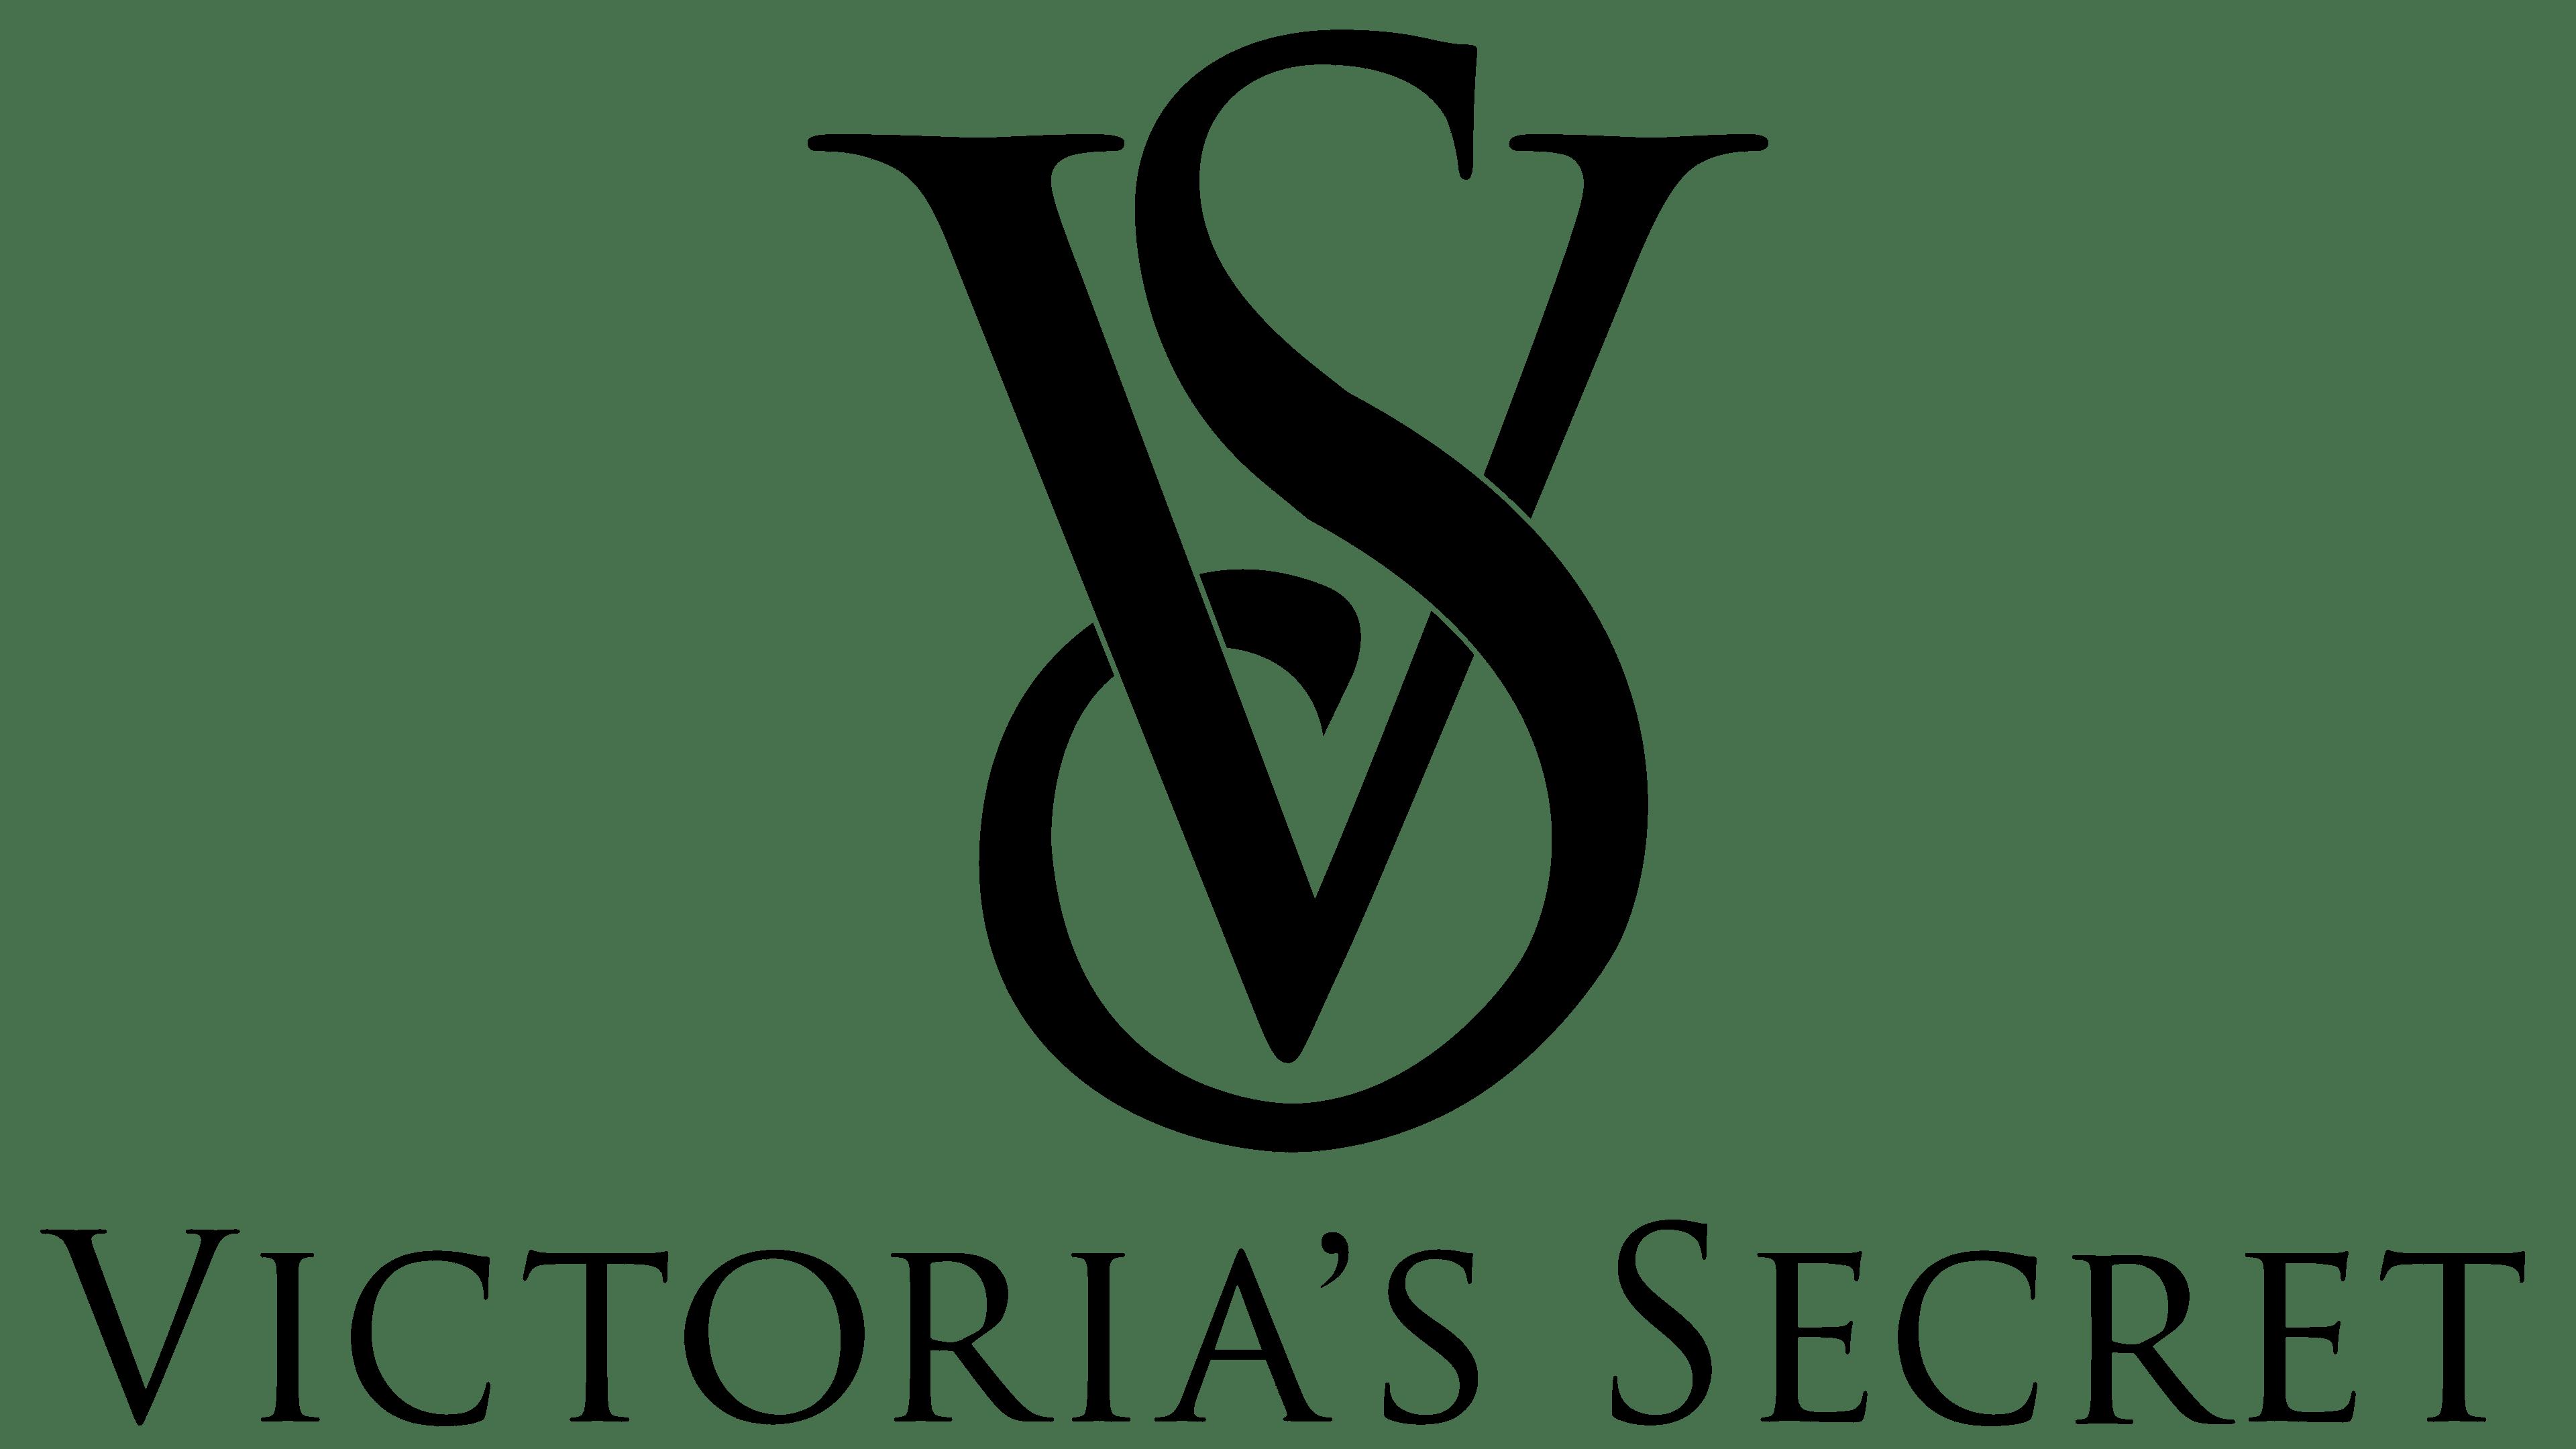 logos-marcas.com/wp-content/uploads/2020/05/Vic...